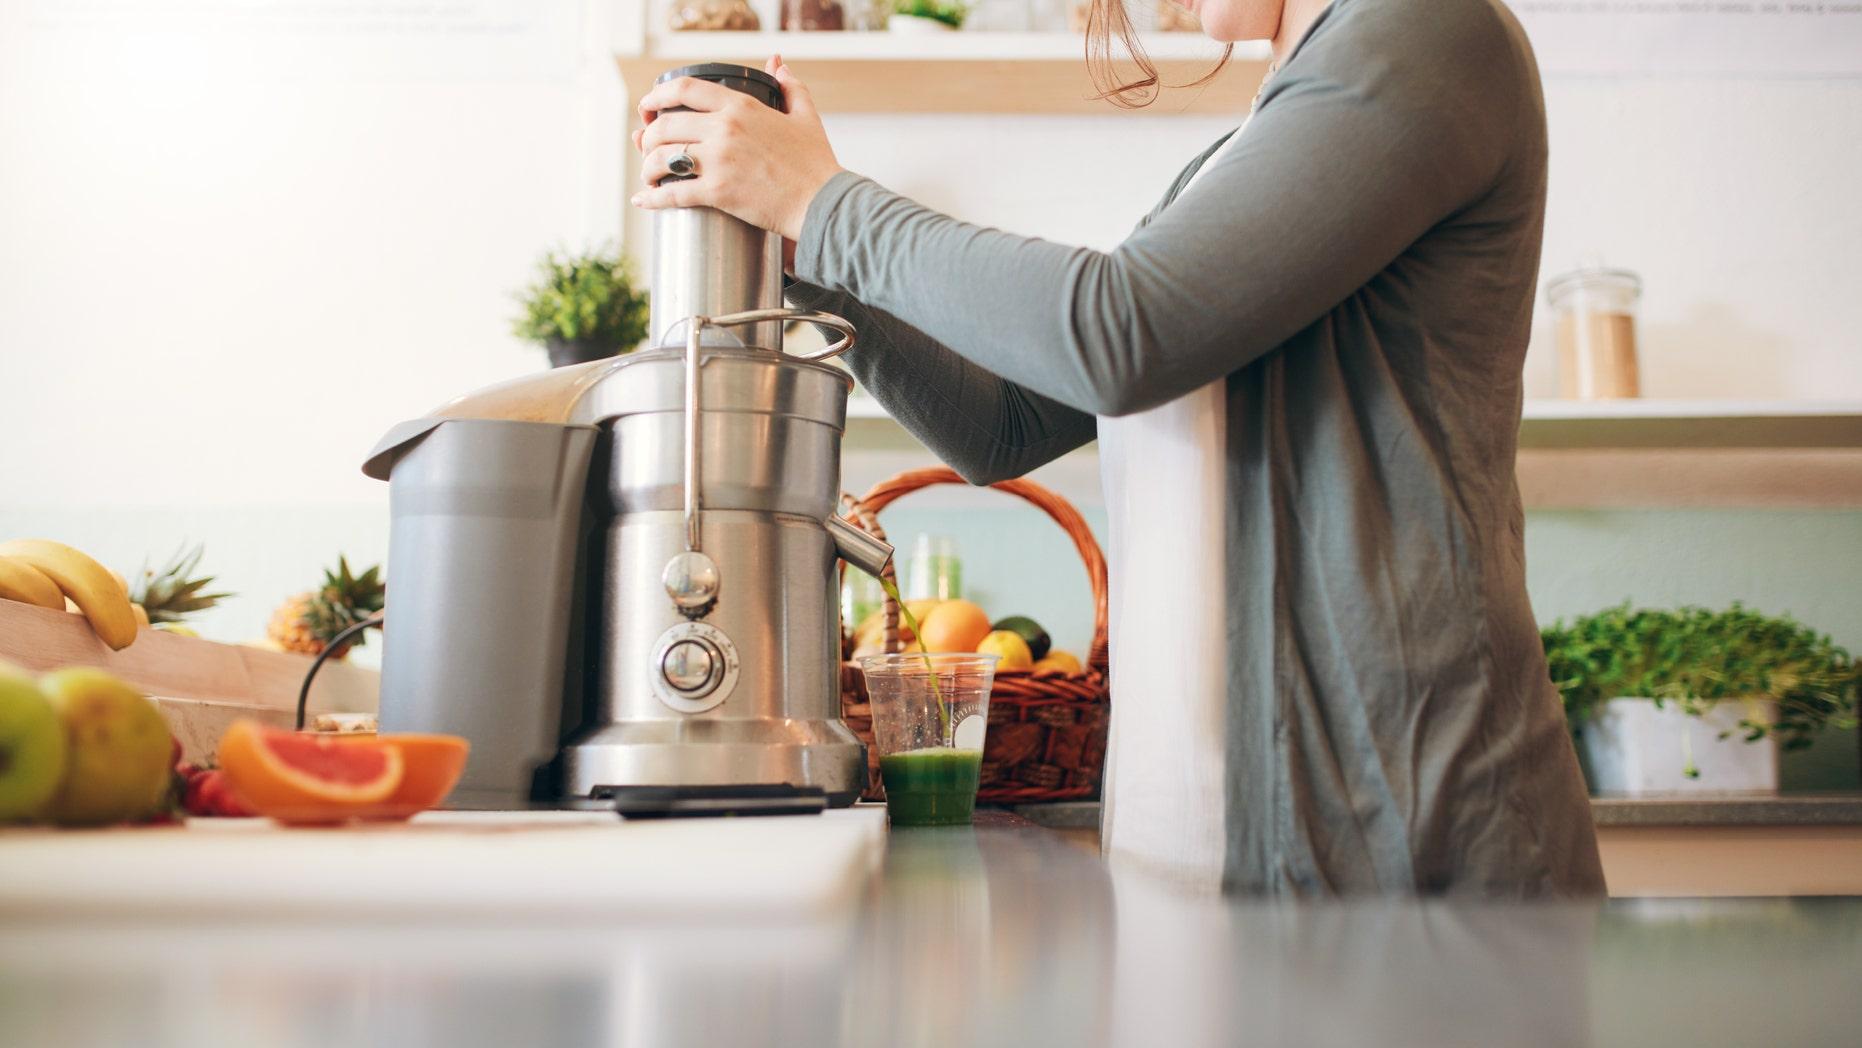 Cropped shot of  young female bar employee making fruit juice using juicer machine at counter.